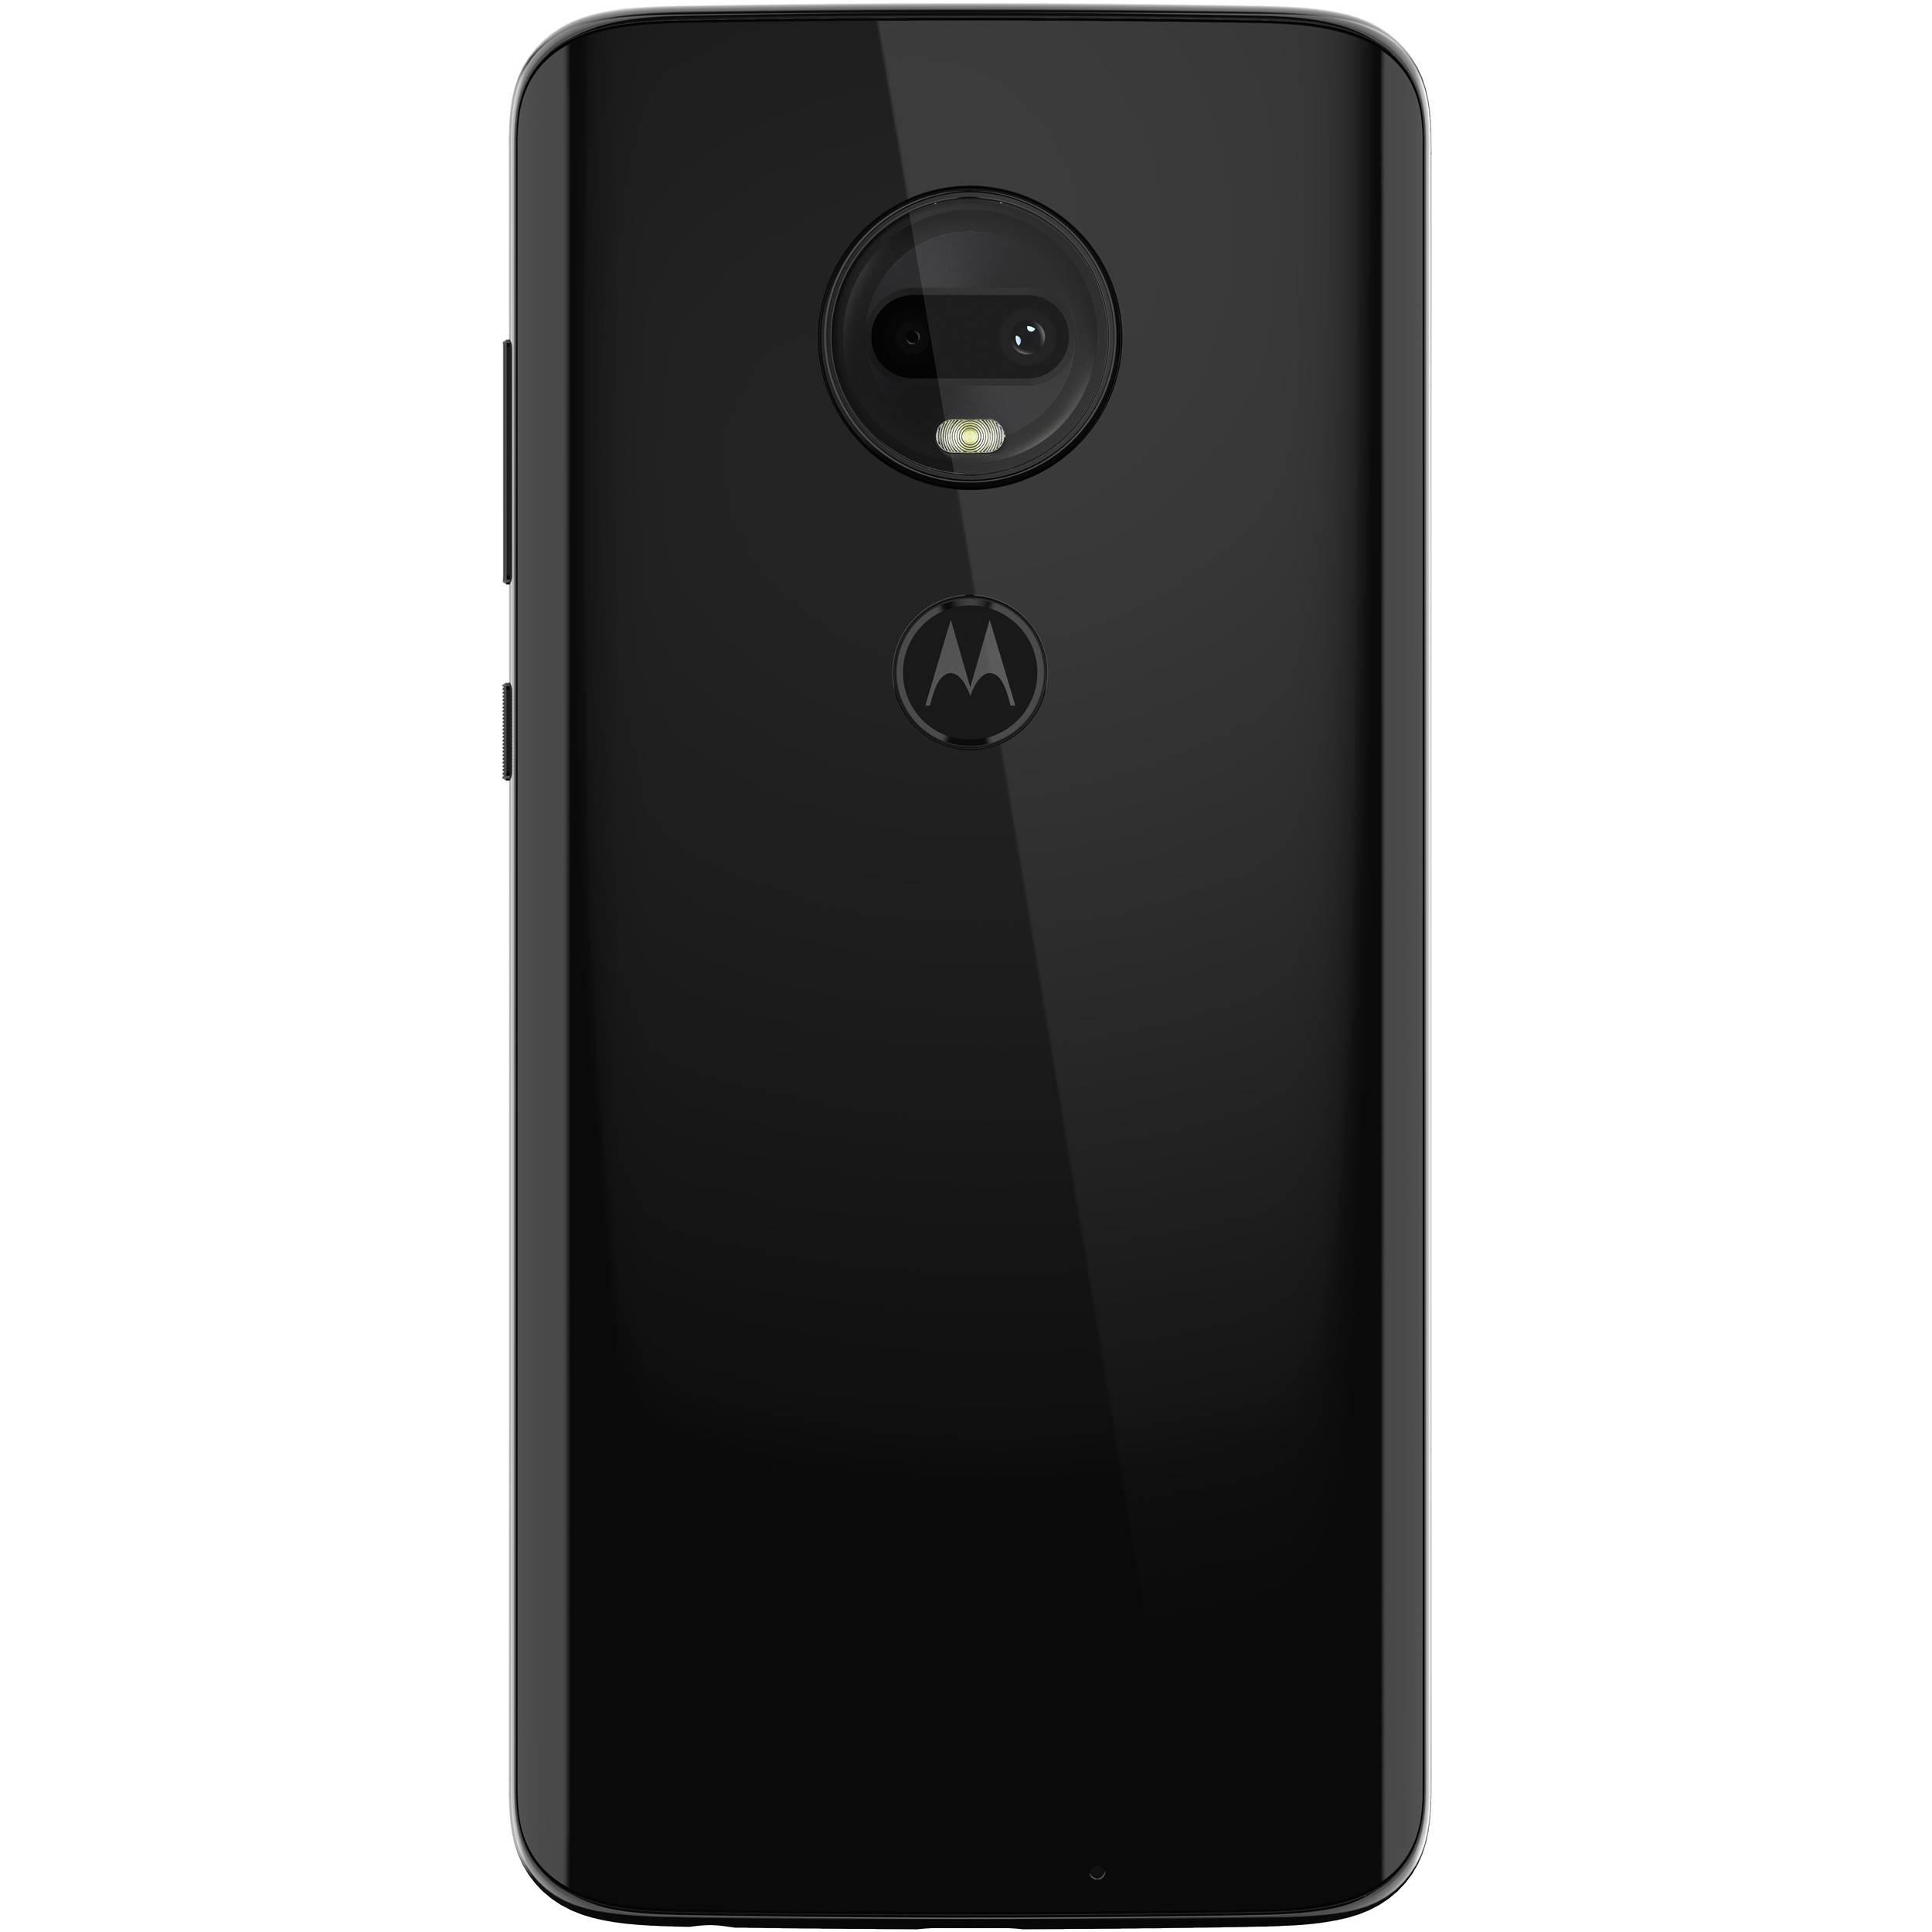 Moto G7 64GB Smartphone (Unlocked, Black)